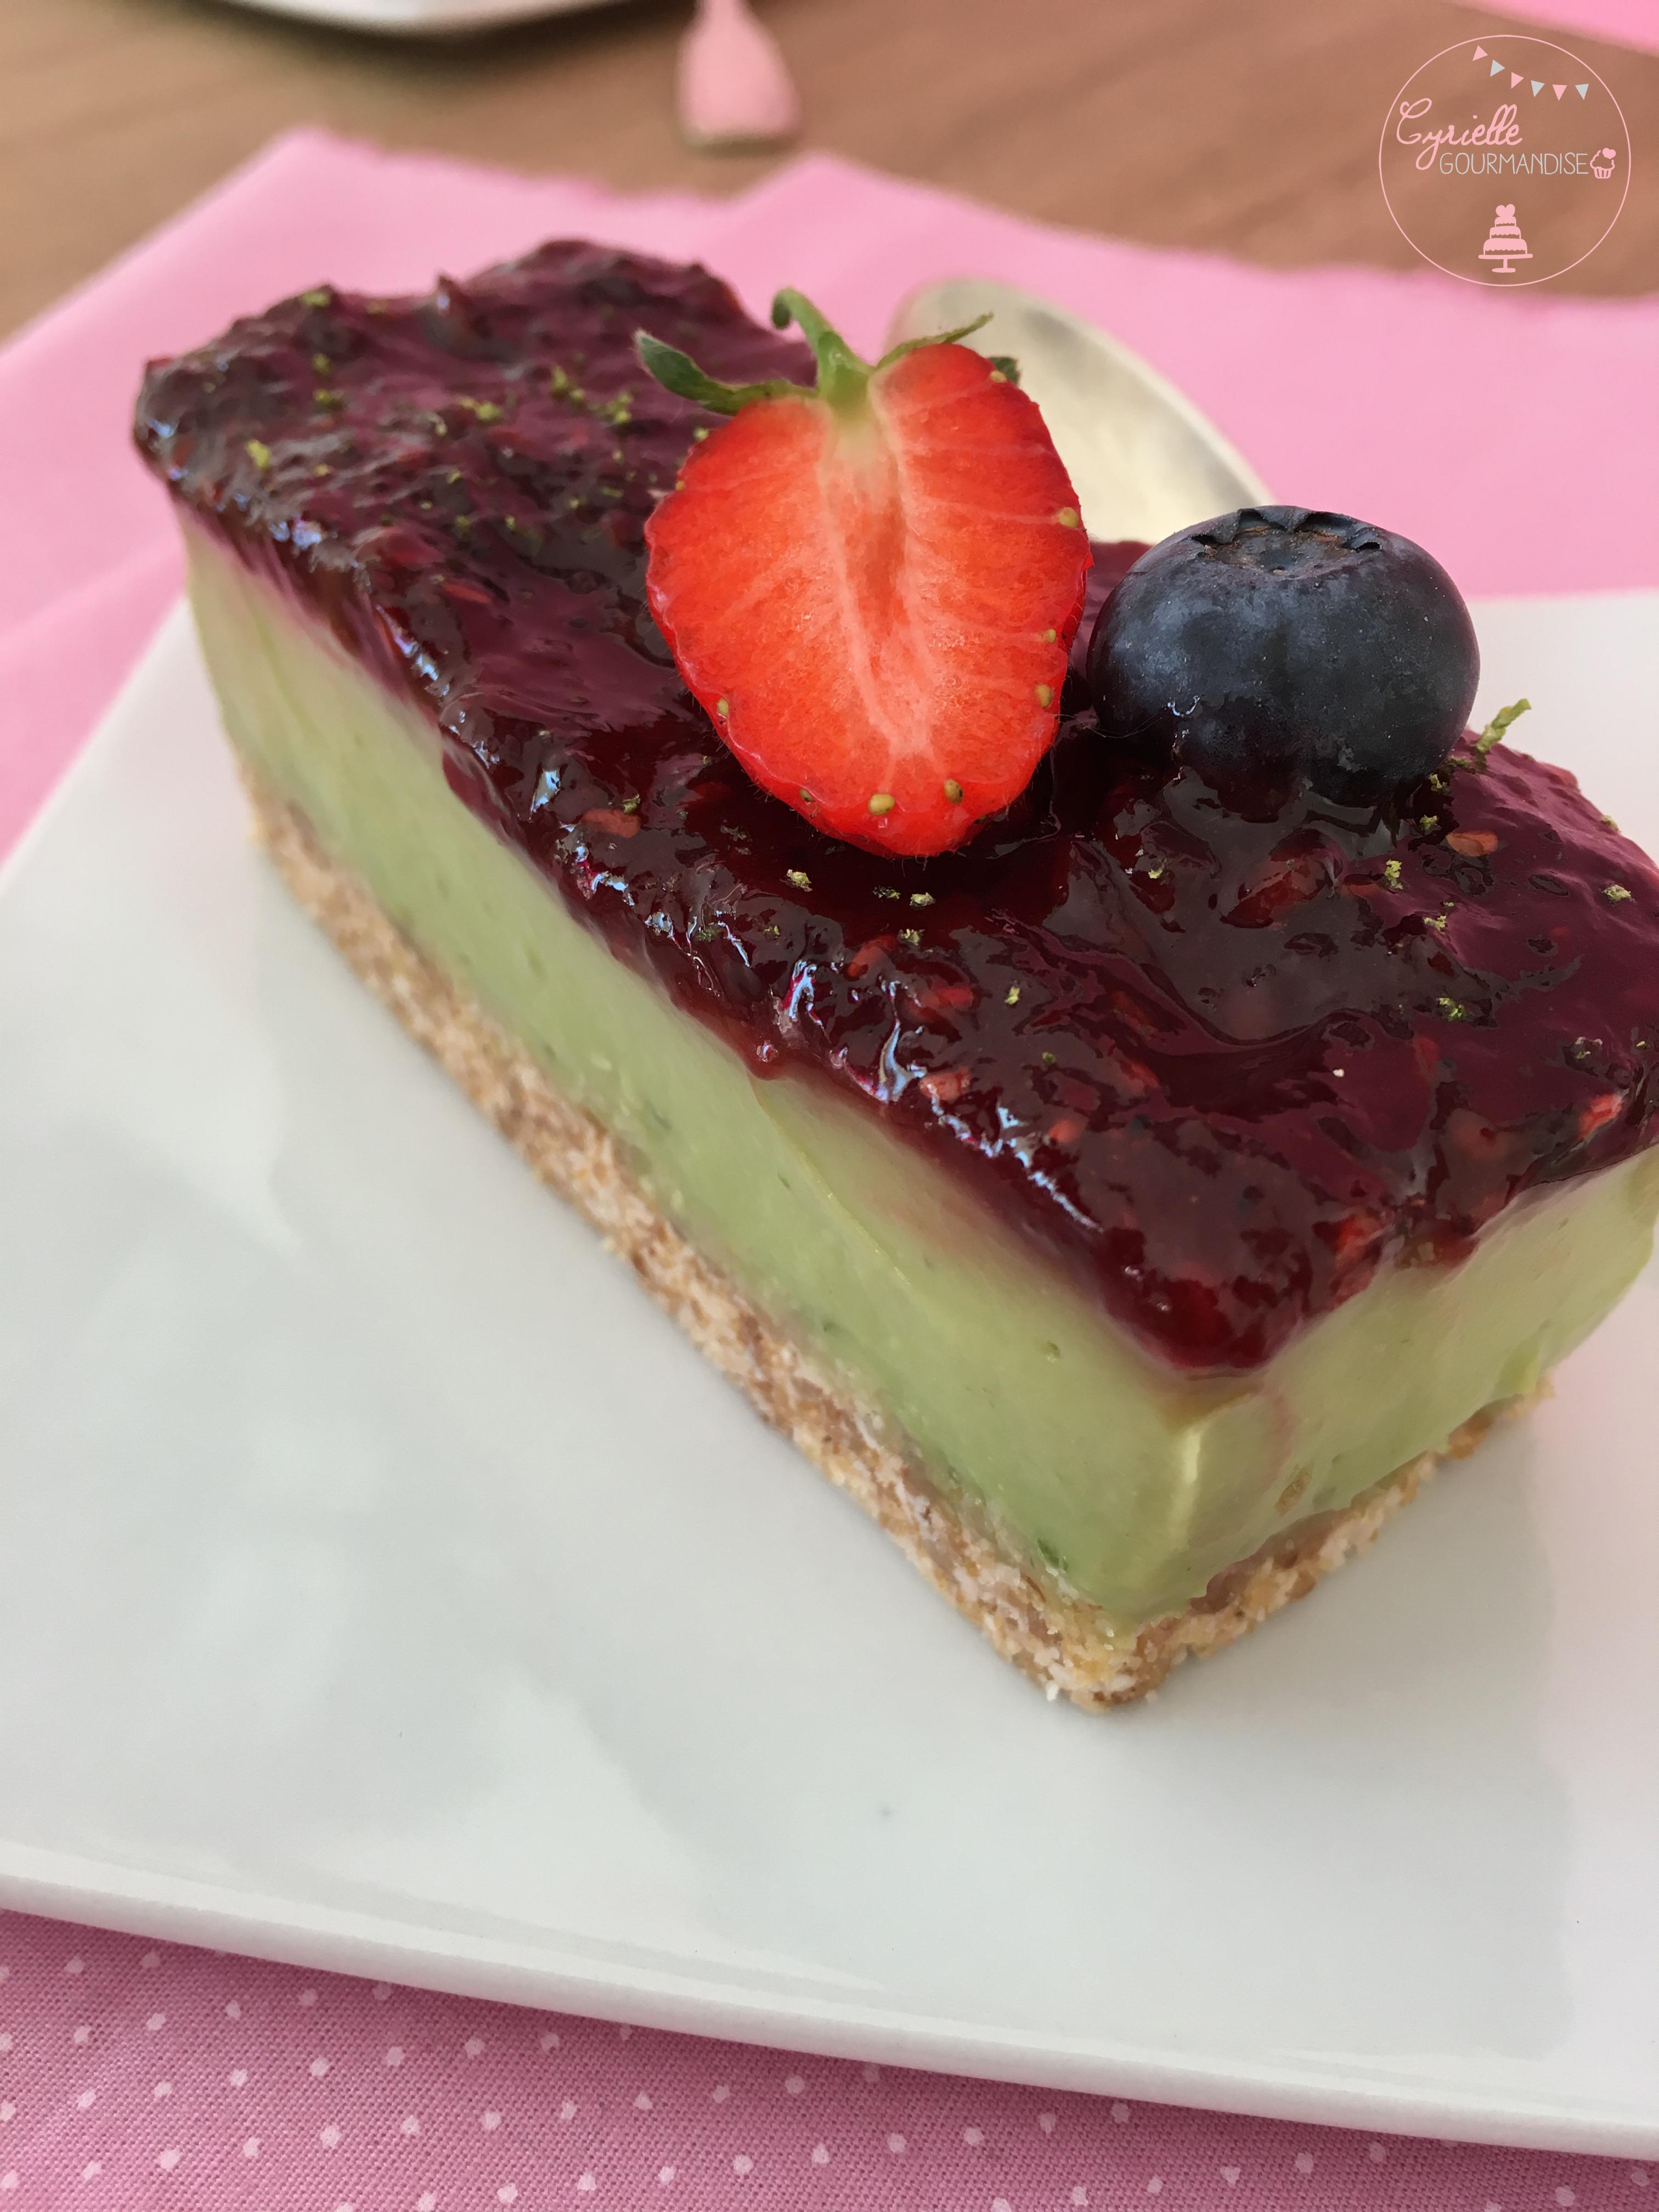 Comme un cheesecake avocat citron vert framboise 5